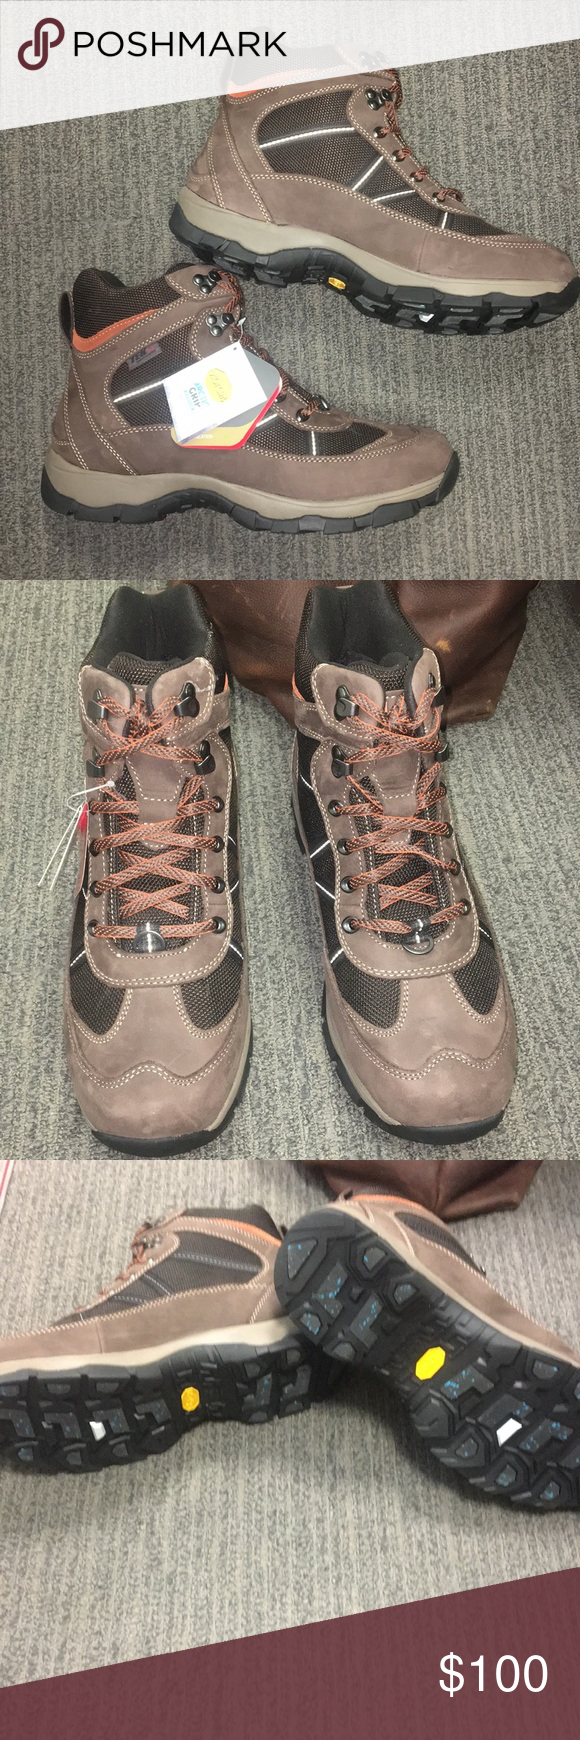 Men's LL BEAN snow sneaker | Snow